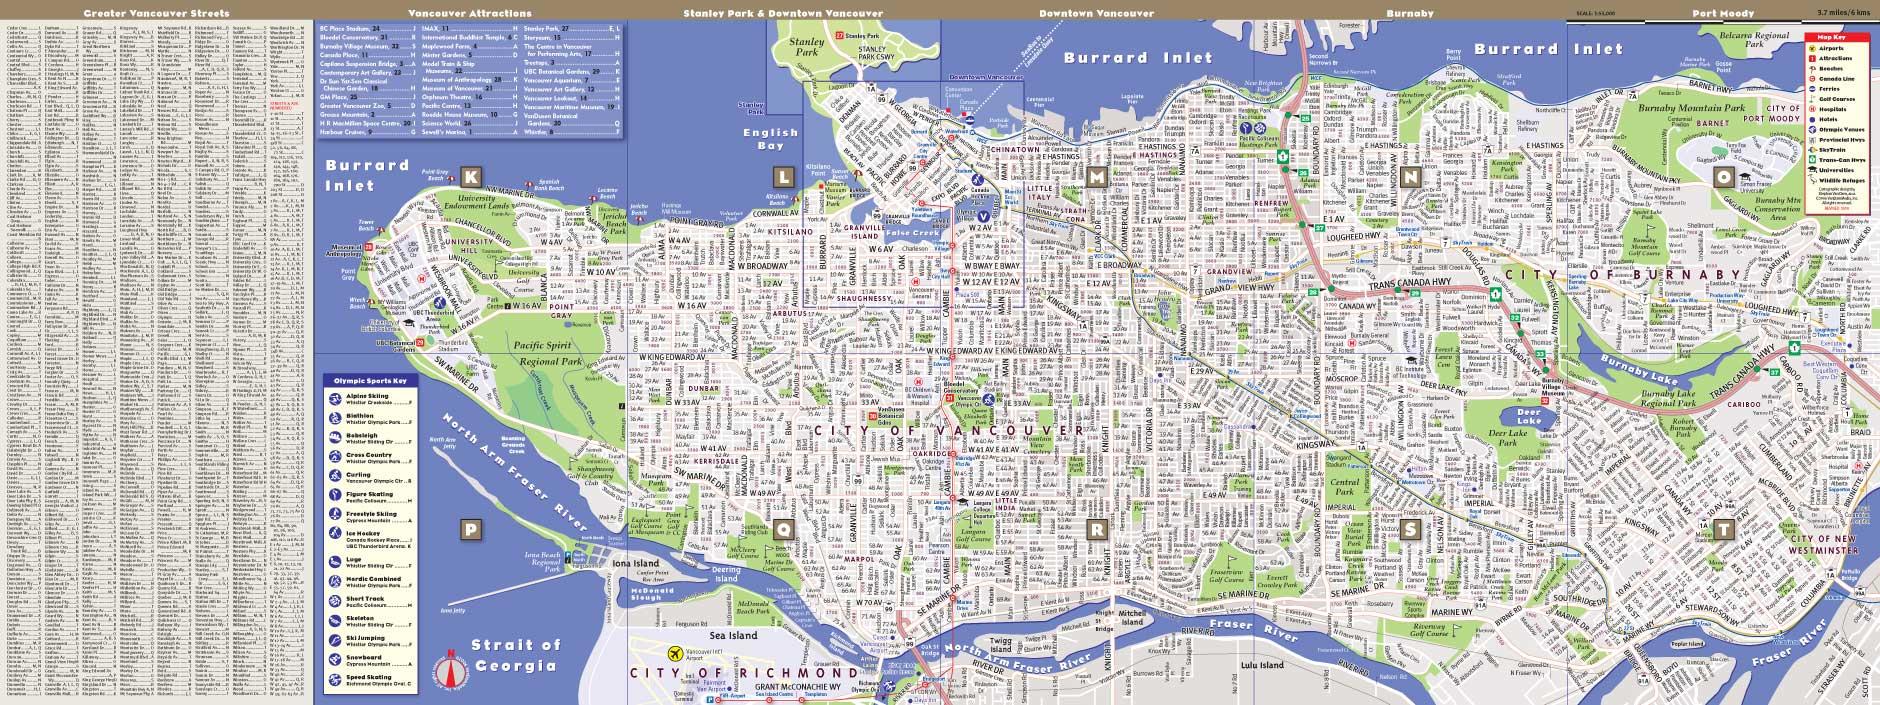 Vancouver Map by VanDam Vancouver StreetSmart Map City Street